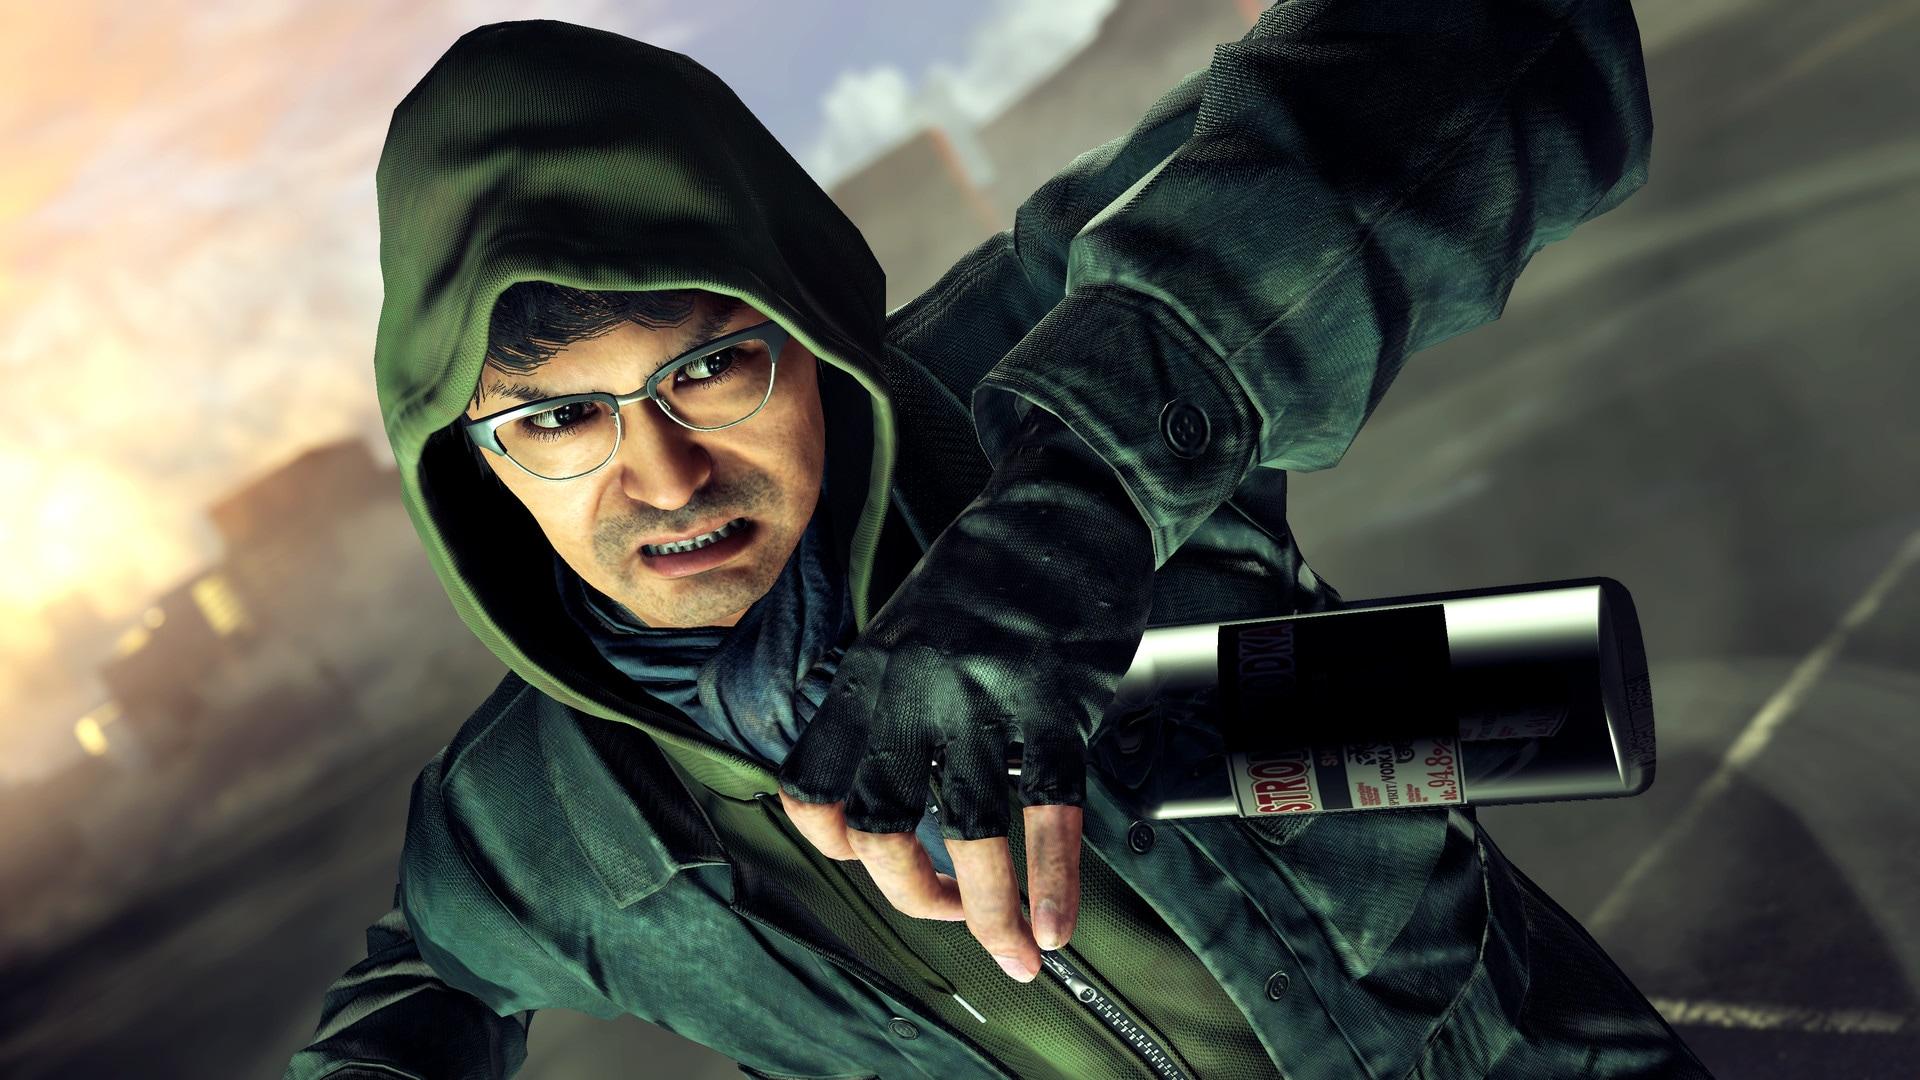 Yakuza: Like a Dragon | Day Ichi Edition (Xbox One, Windows 10) - Xbox Live Key - UNITED STATES - 4